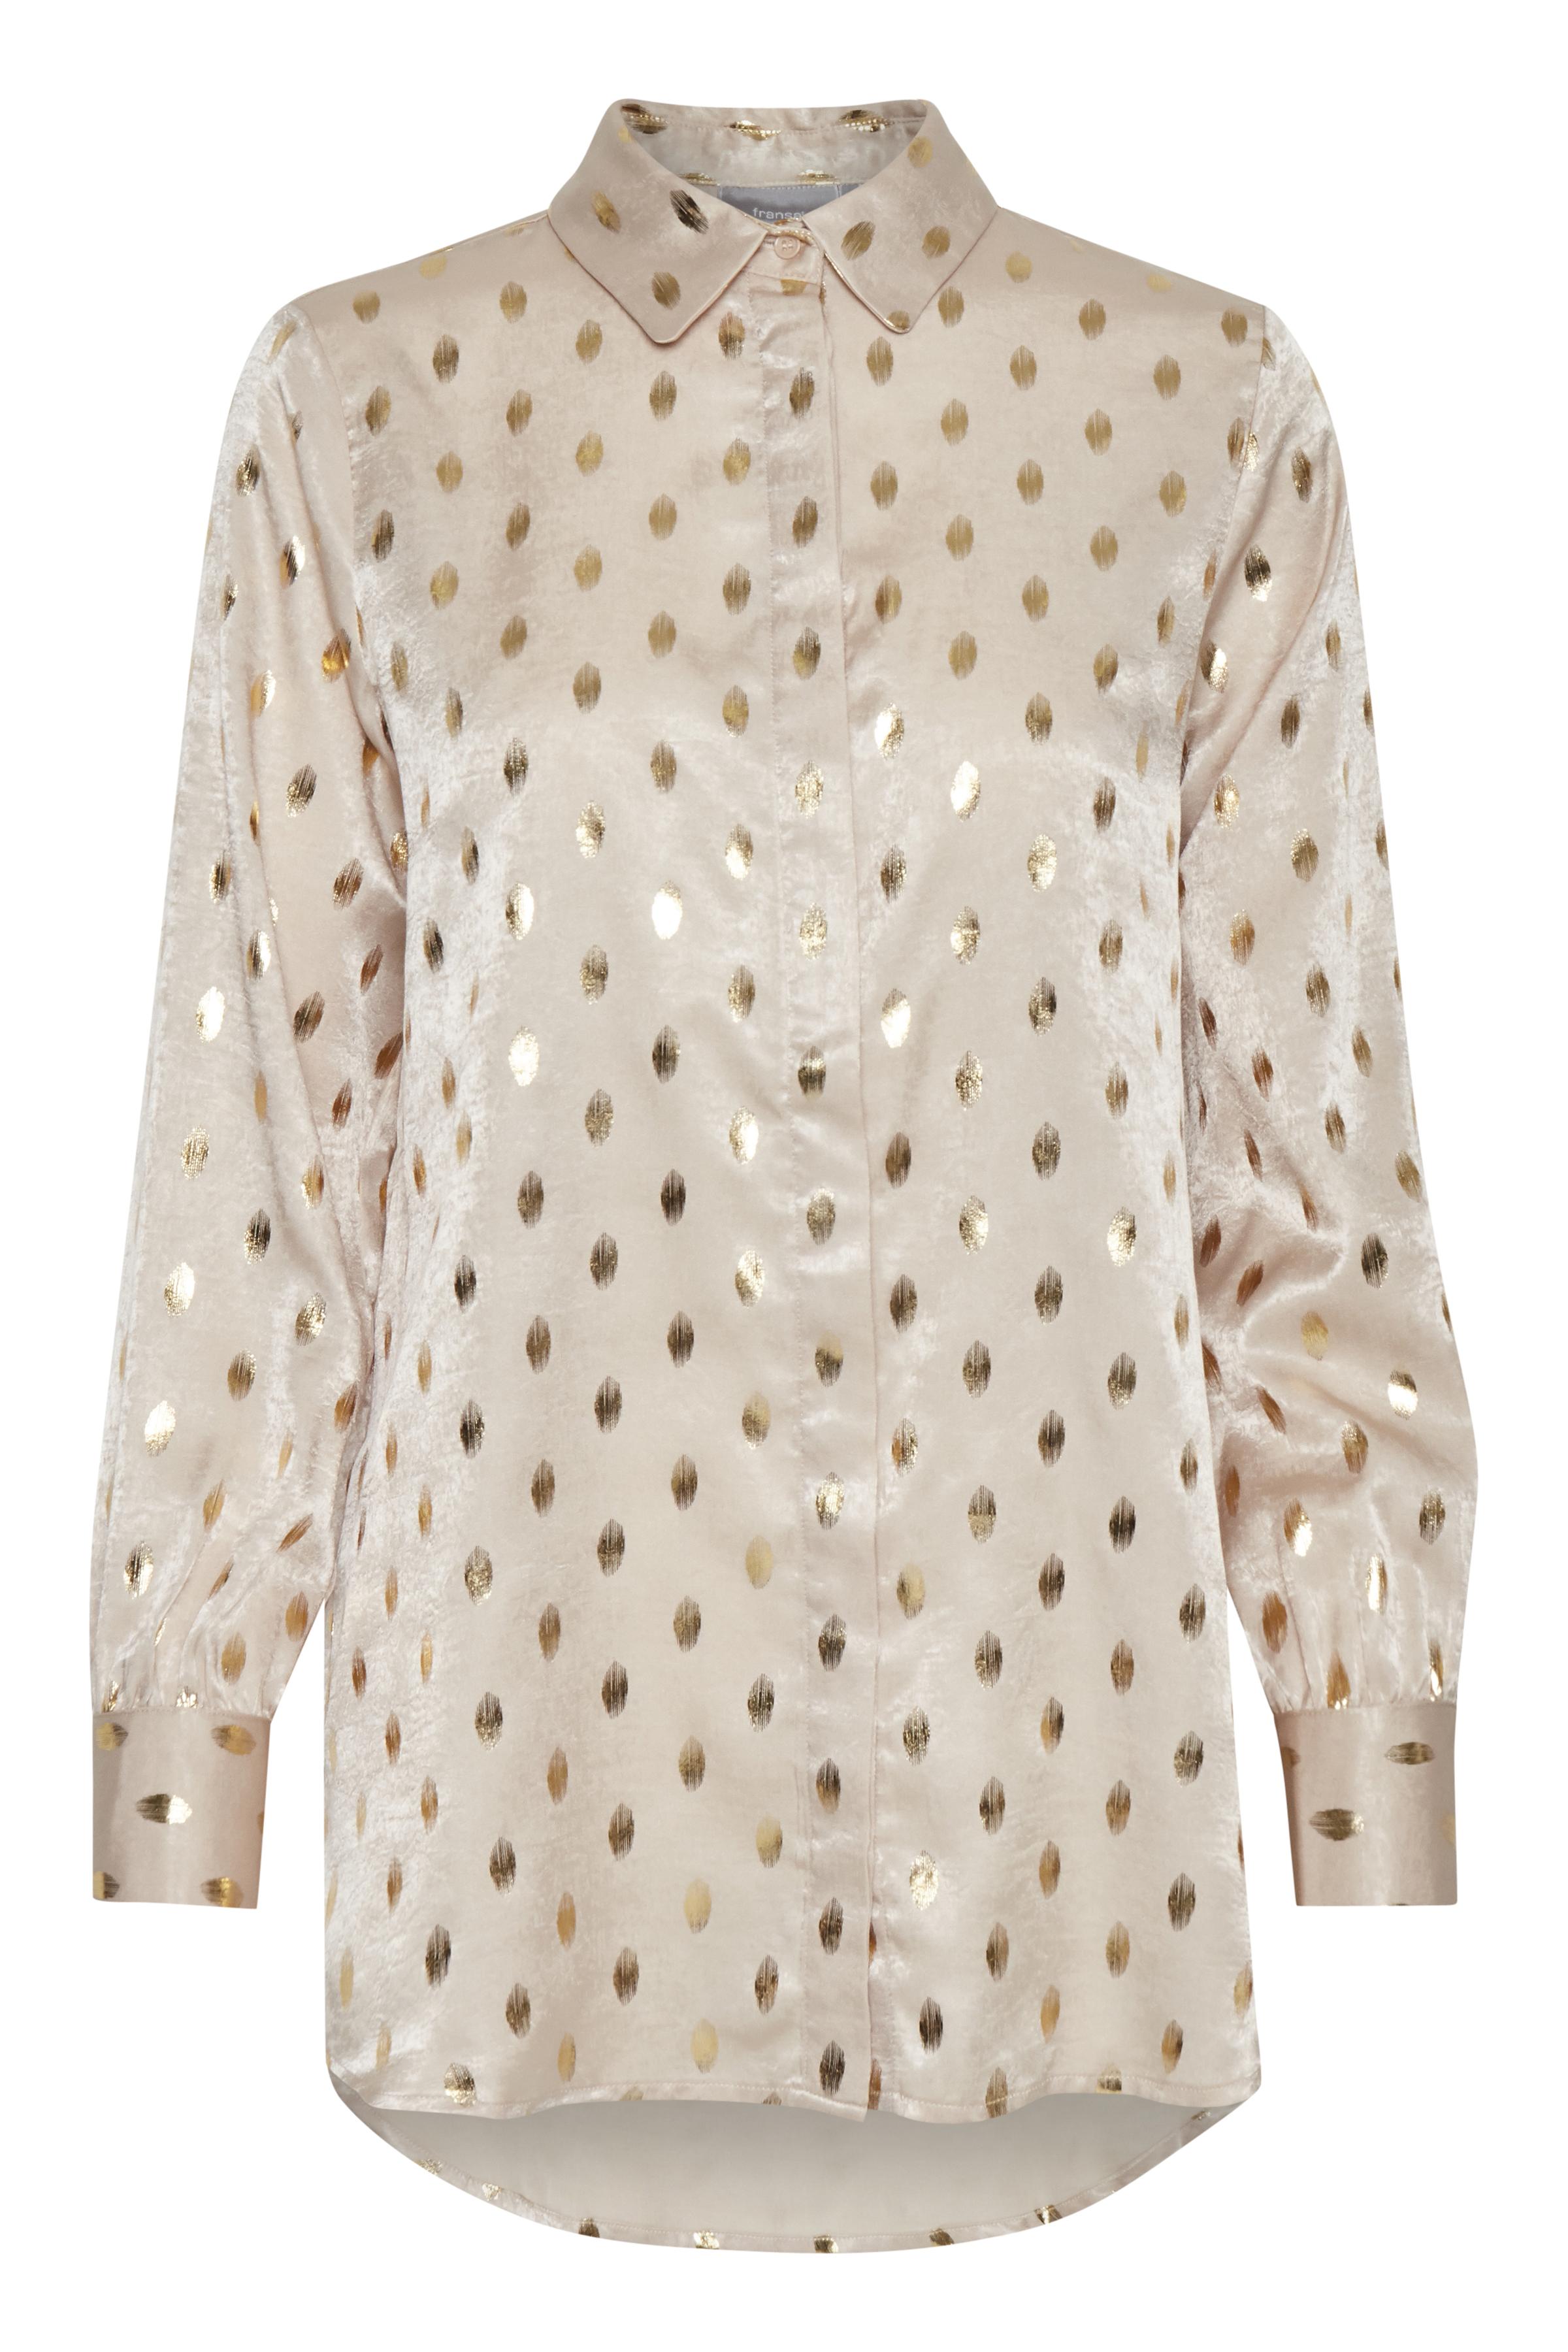 Image of Fransa Dame Skjorte - Off-white/guld